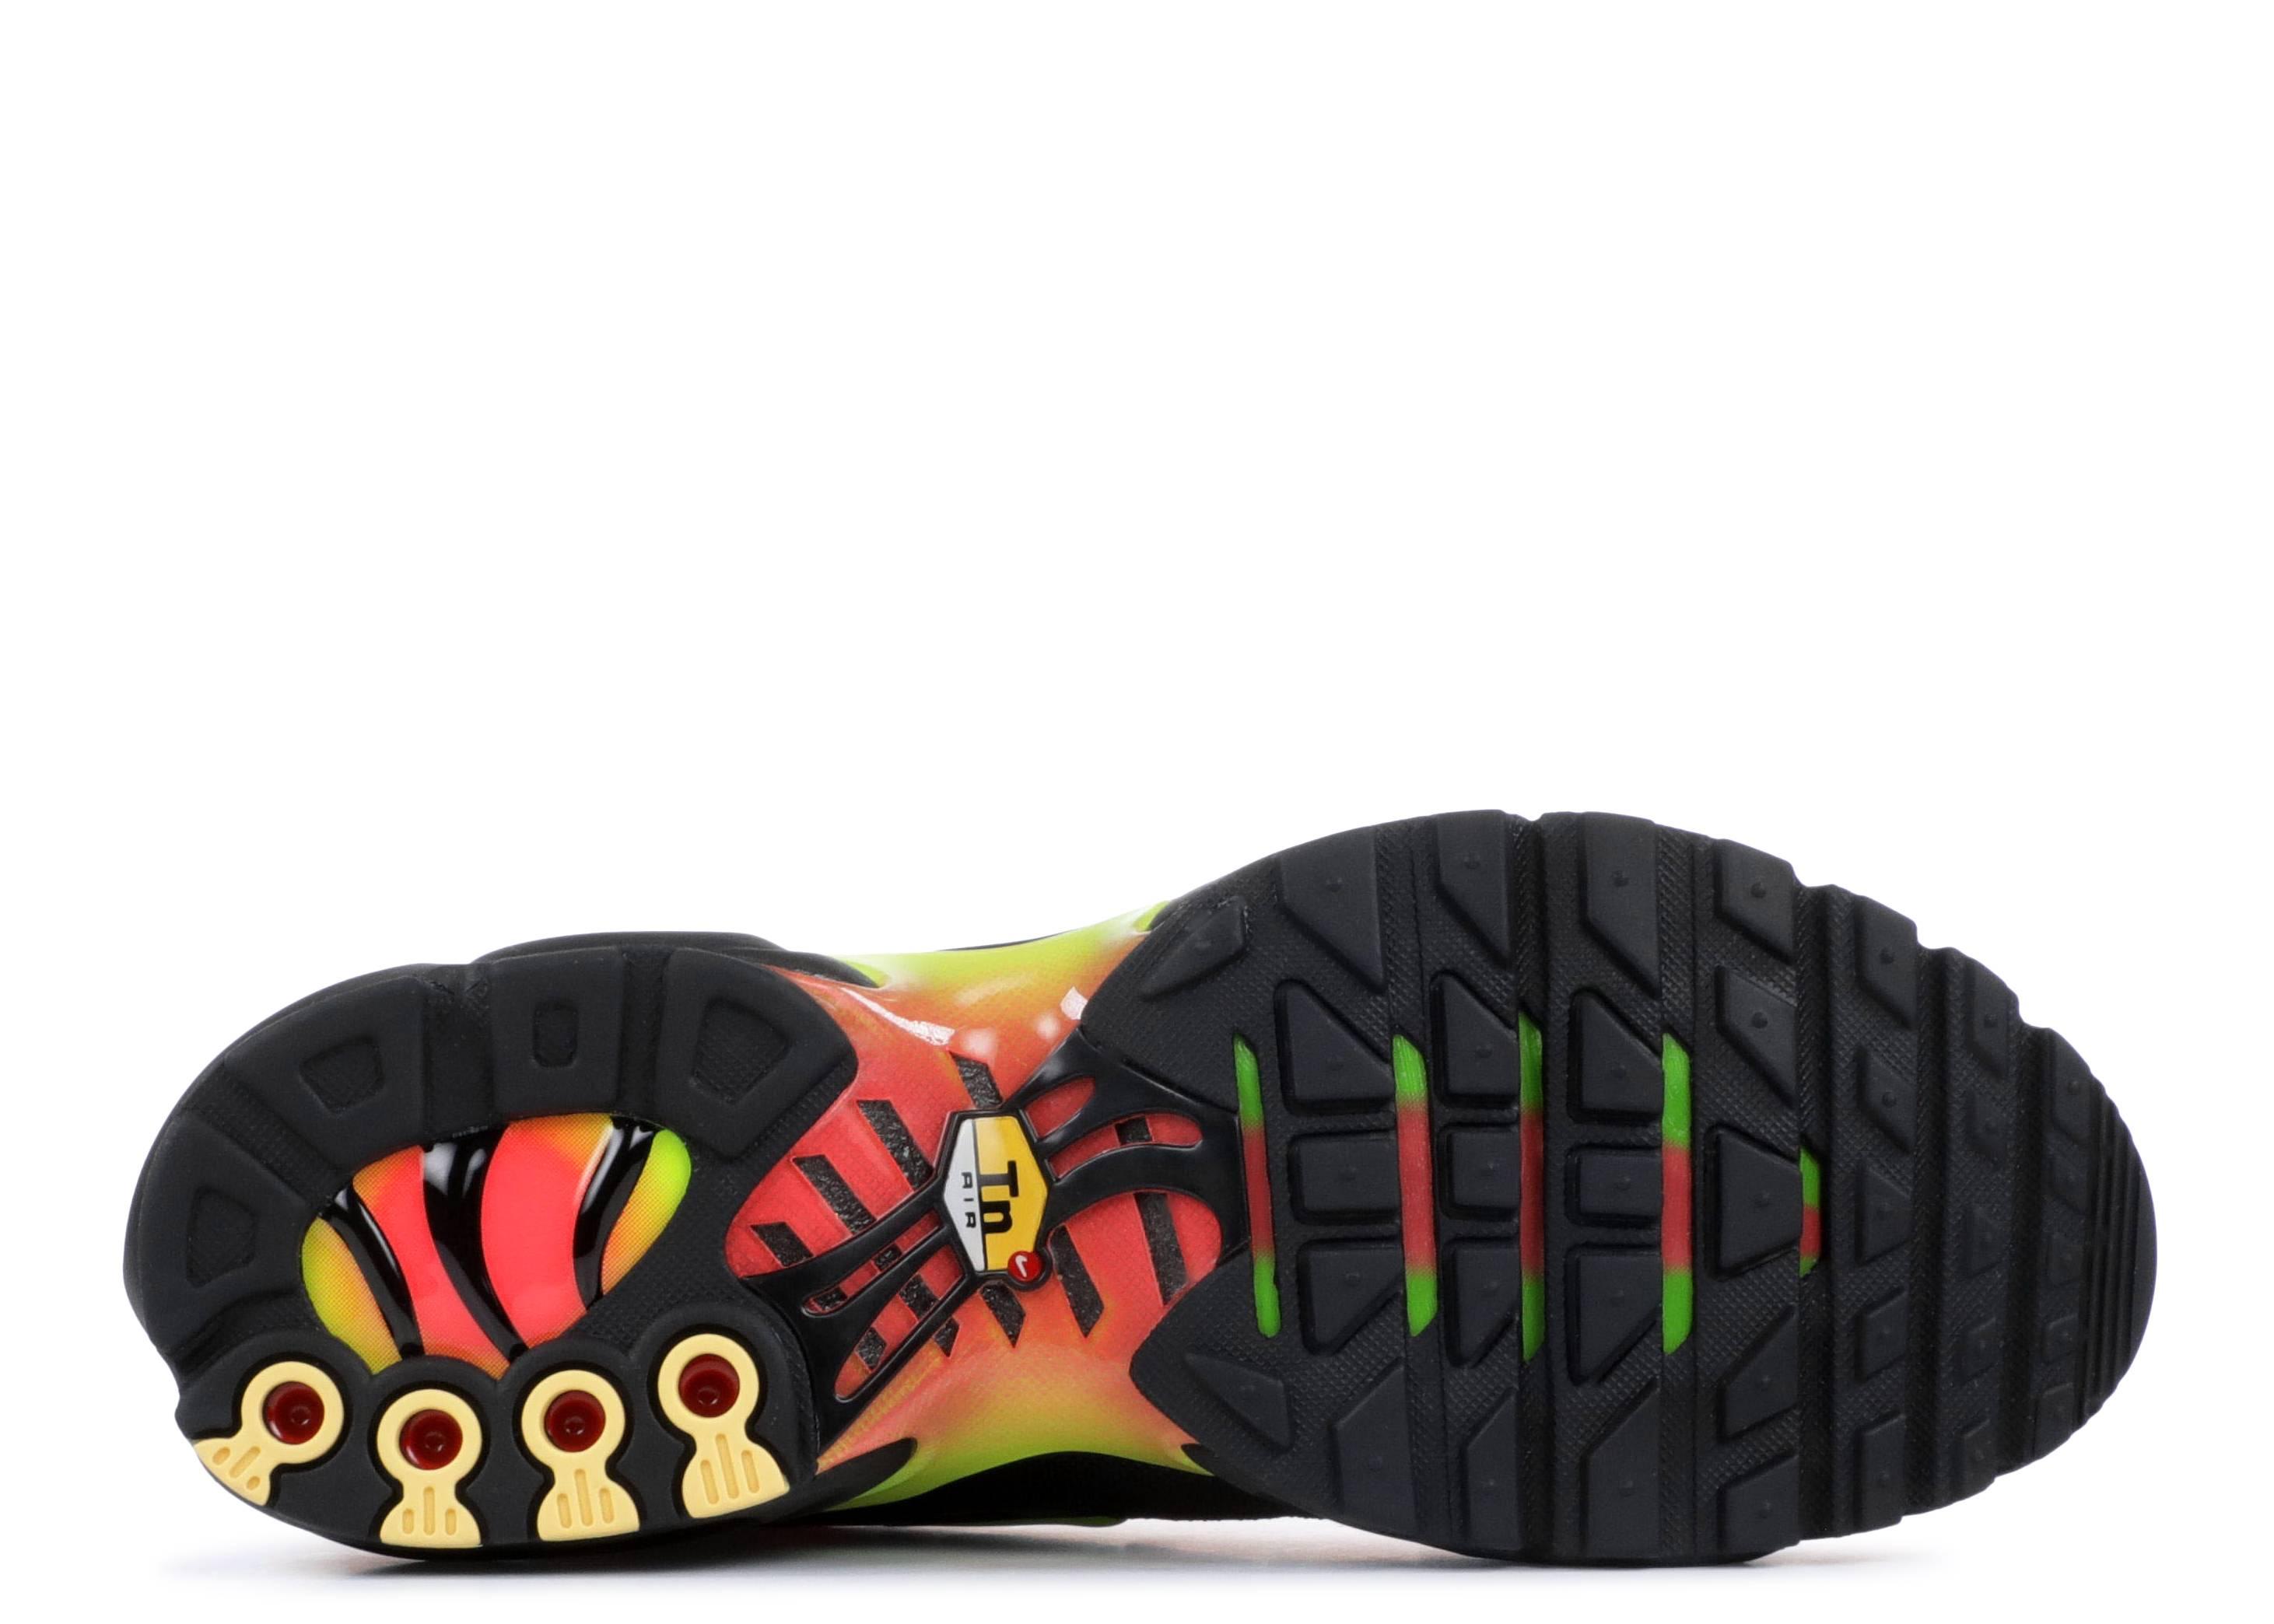 14848332a1 WMNS AIR MAX PLUS TN SE - Nike - aq9979 001 - black/volt-solar red | Flight  Club